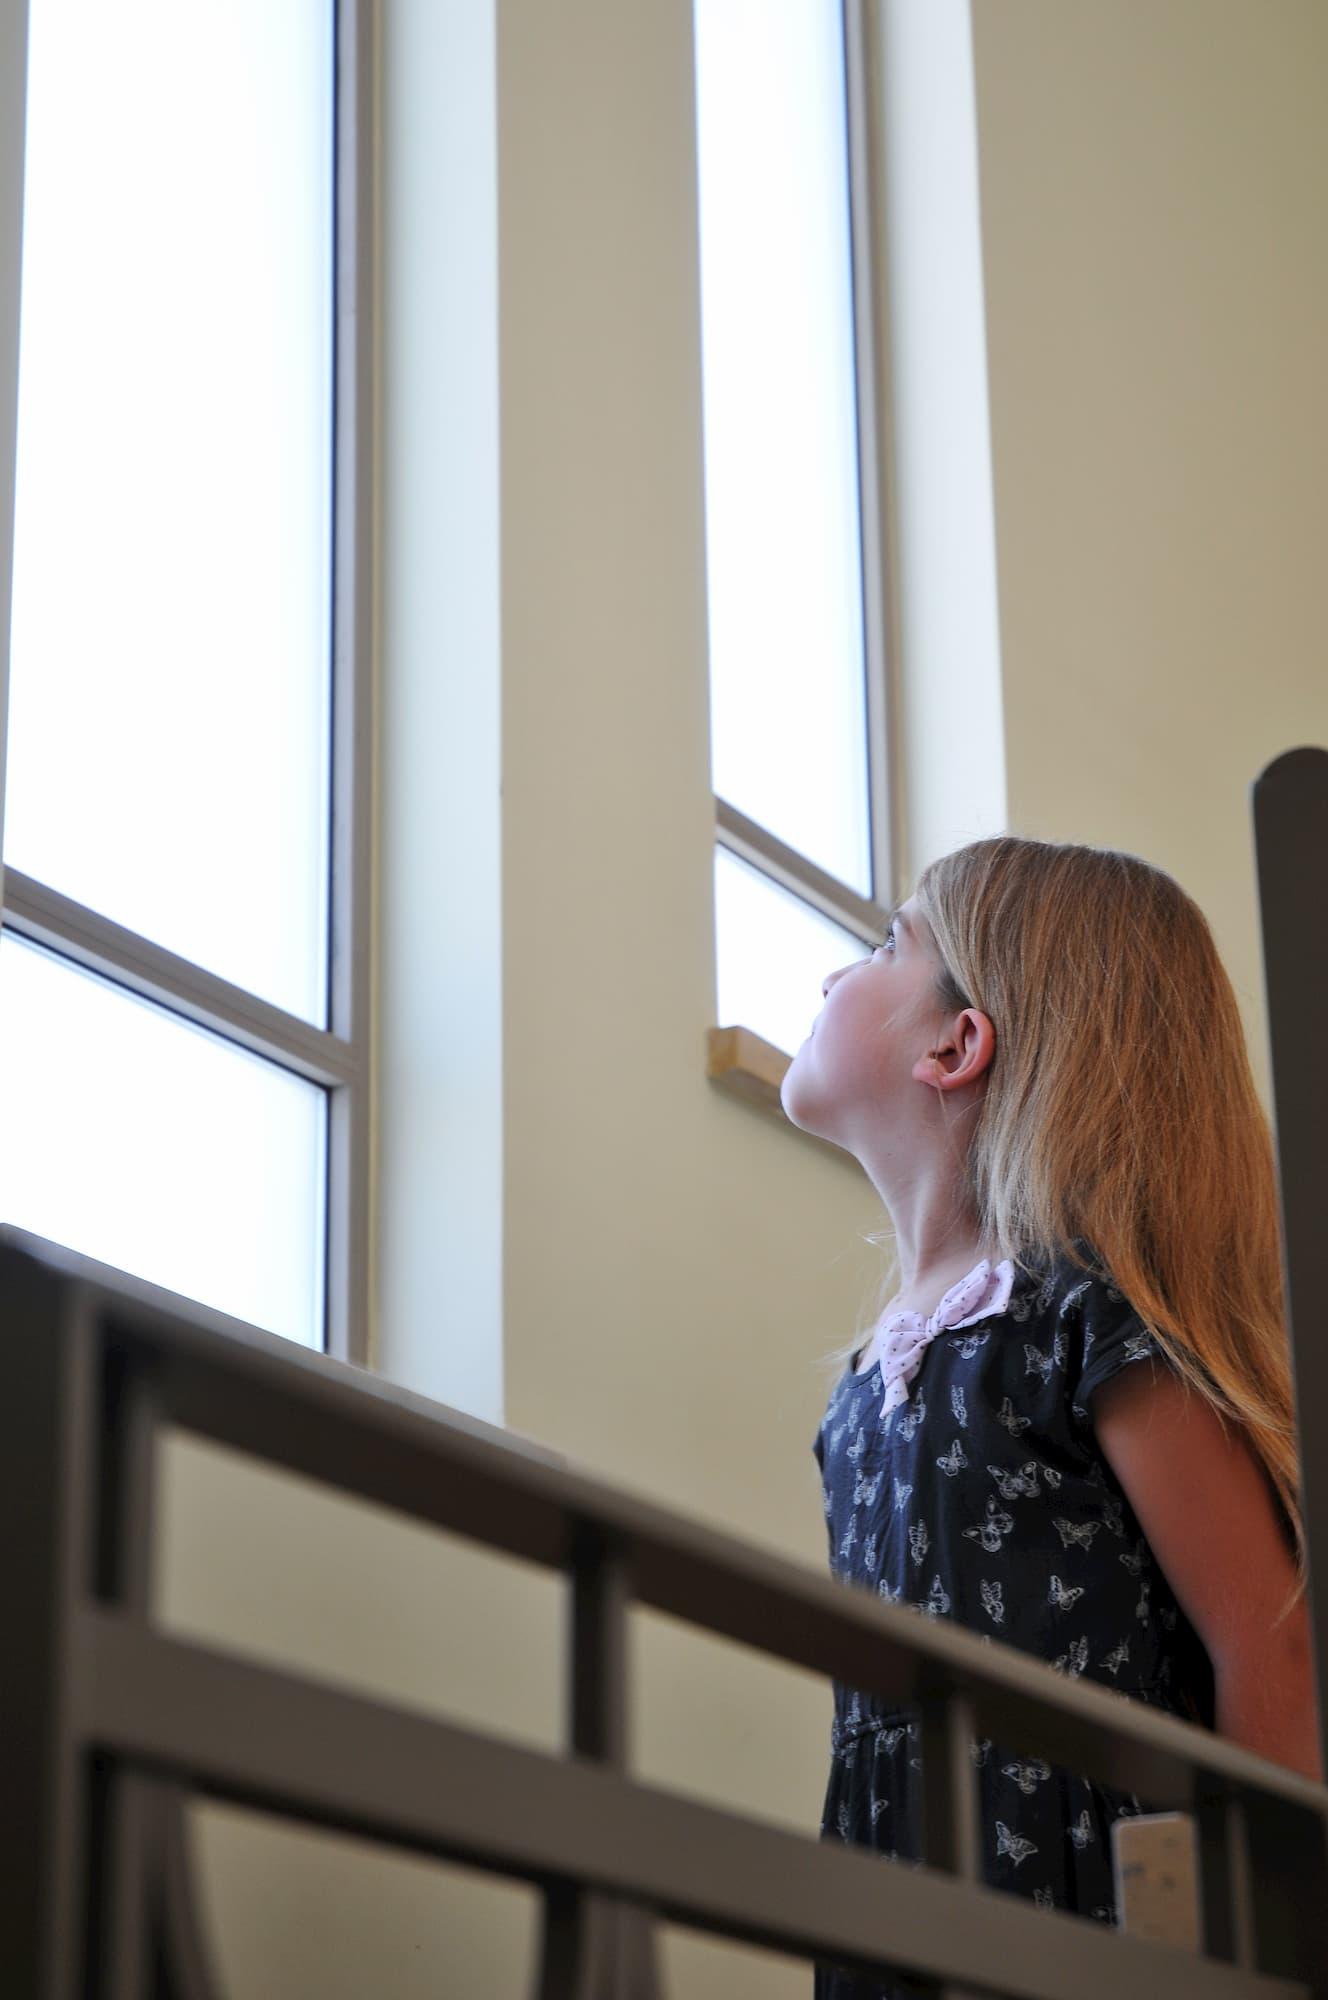 Girl looking up at elongated windows